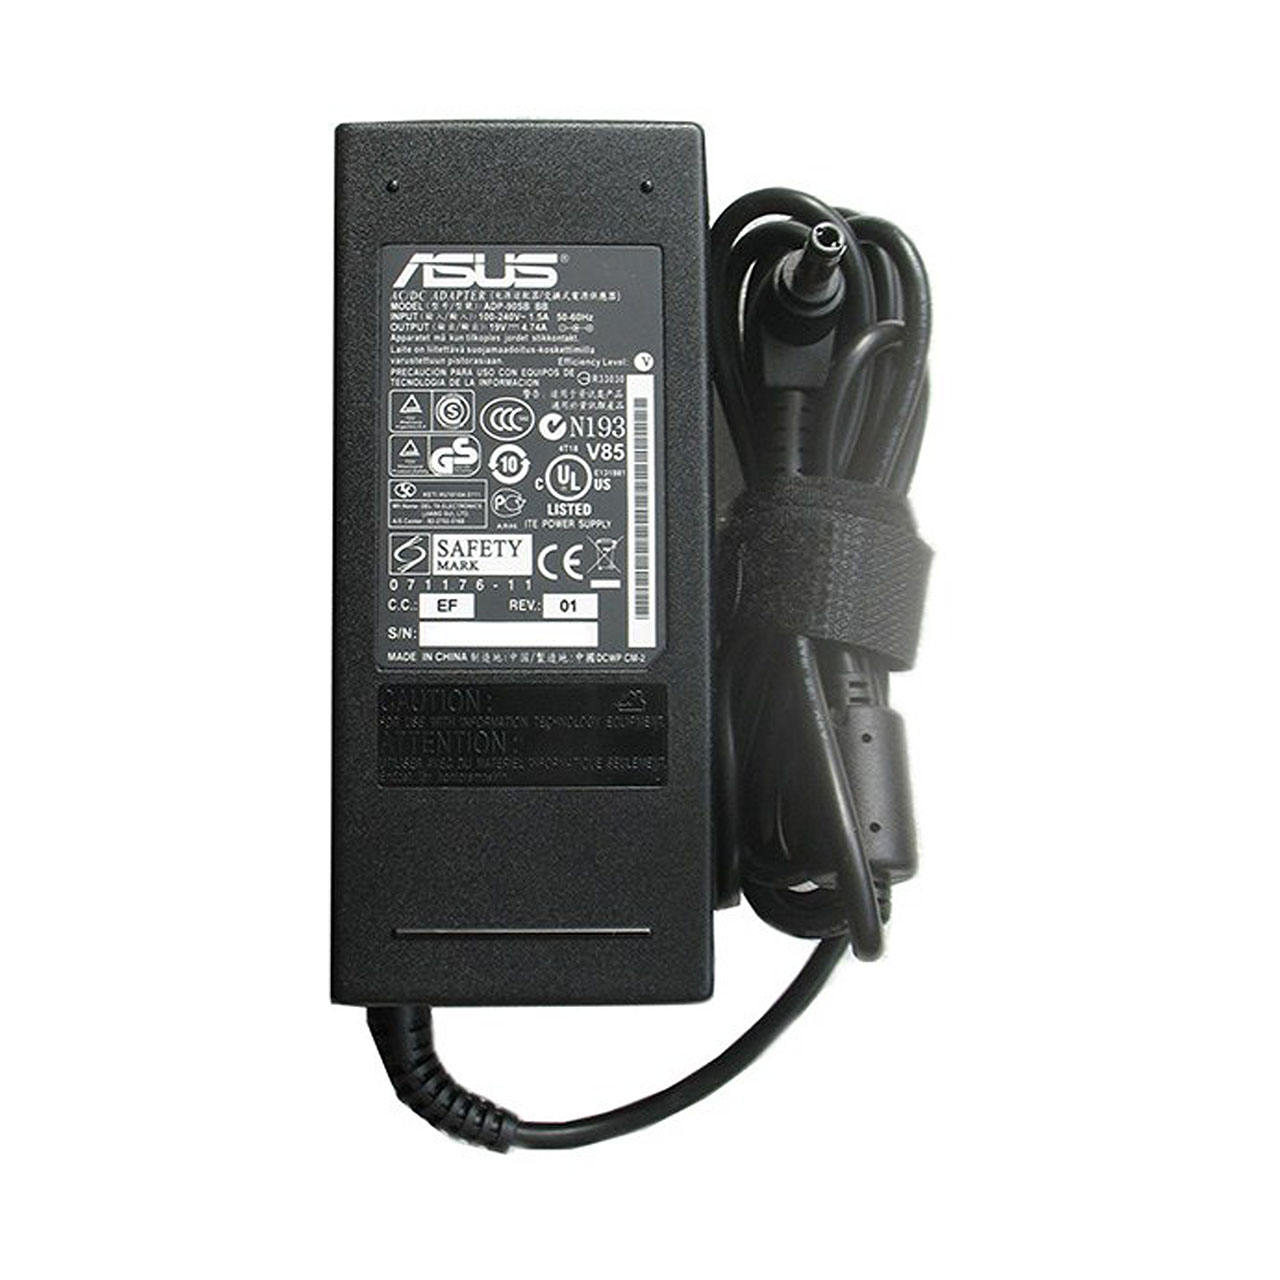 شارژر لپ تاپ 19 ولت 4.74 آمپر مدل ADP-90SB BB main 1 1